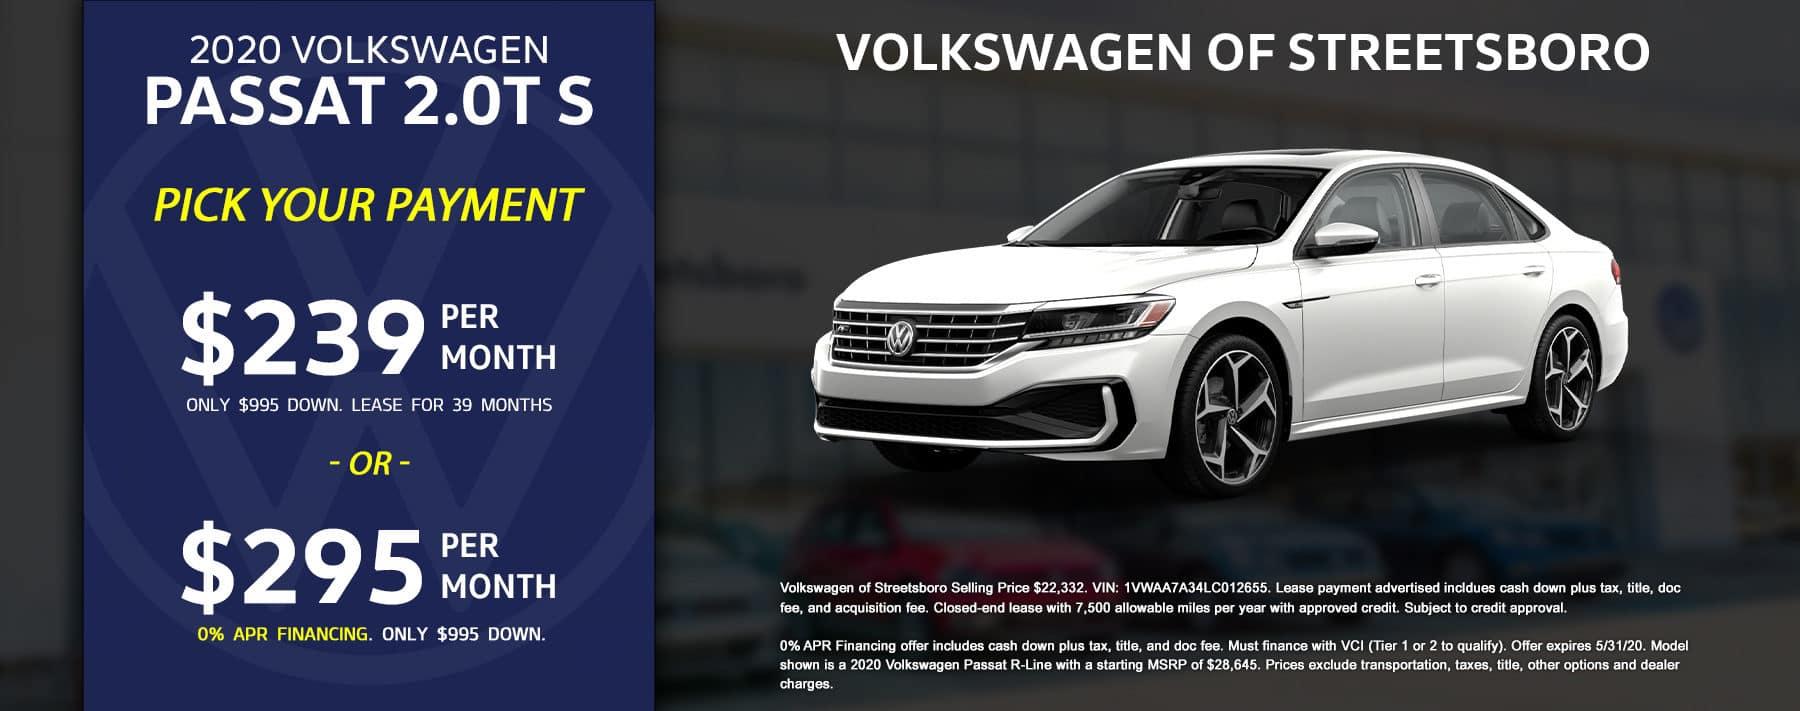 2020 VW Passat - May 2020